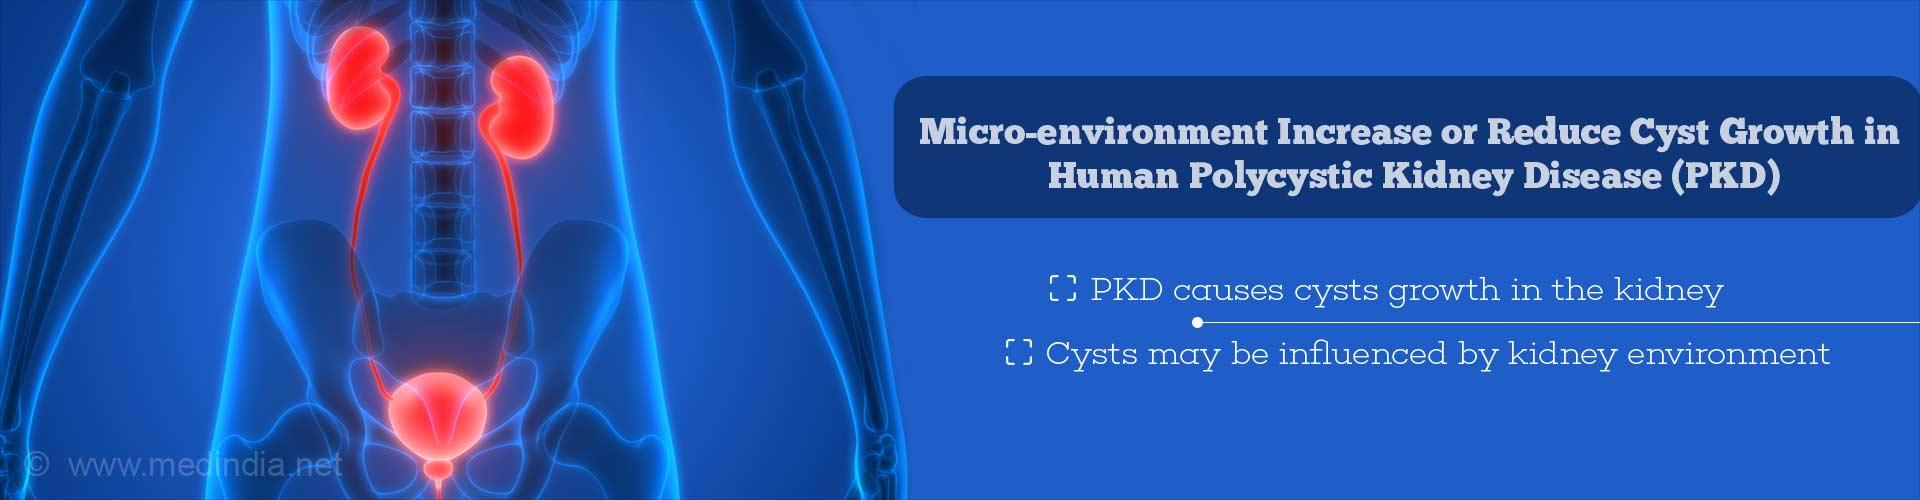 Lab Kidney Reveals Secrets of Polycystic Kidney Disease